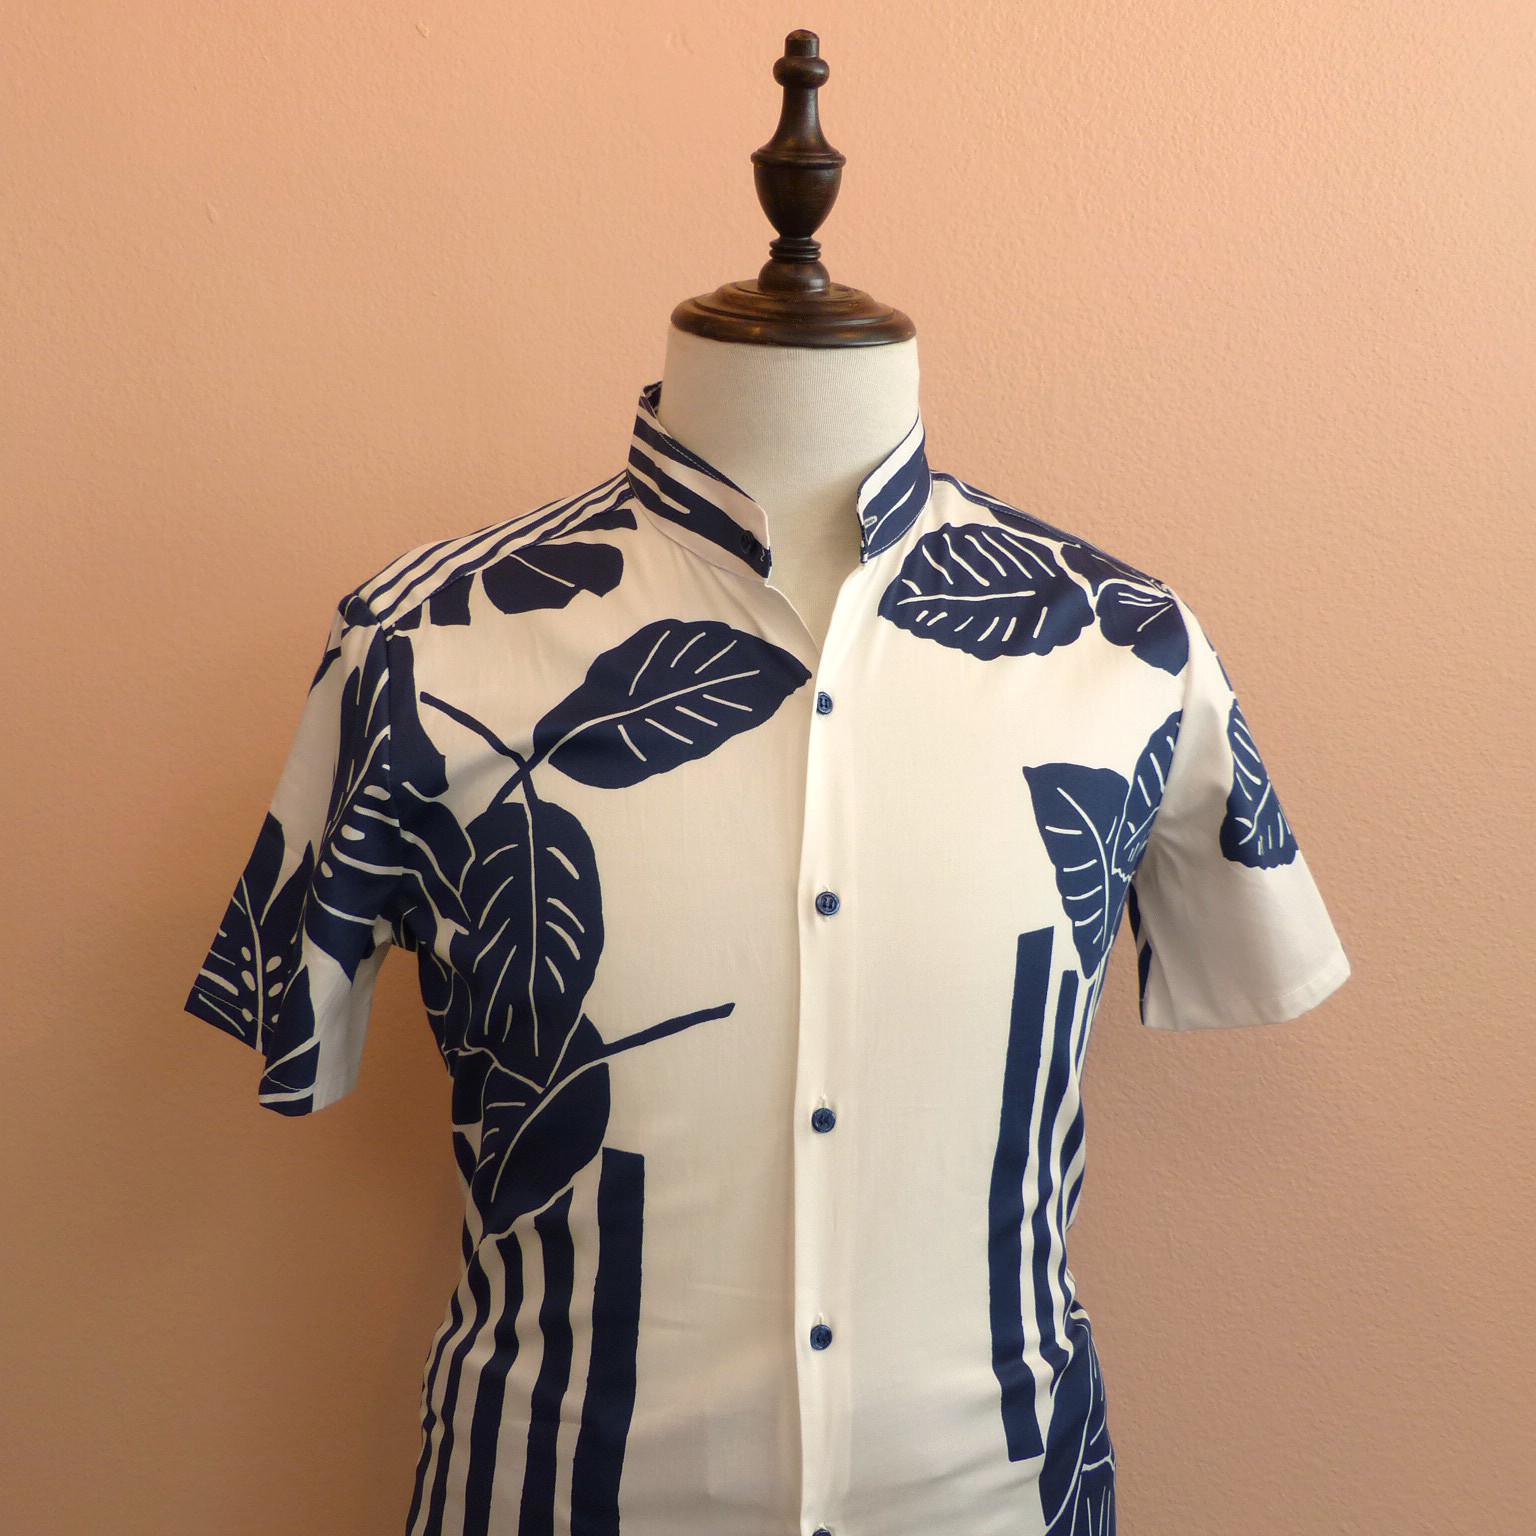 SRT005_Leafy print shirt